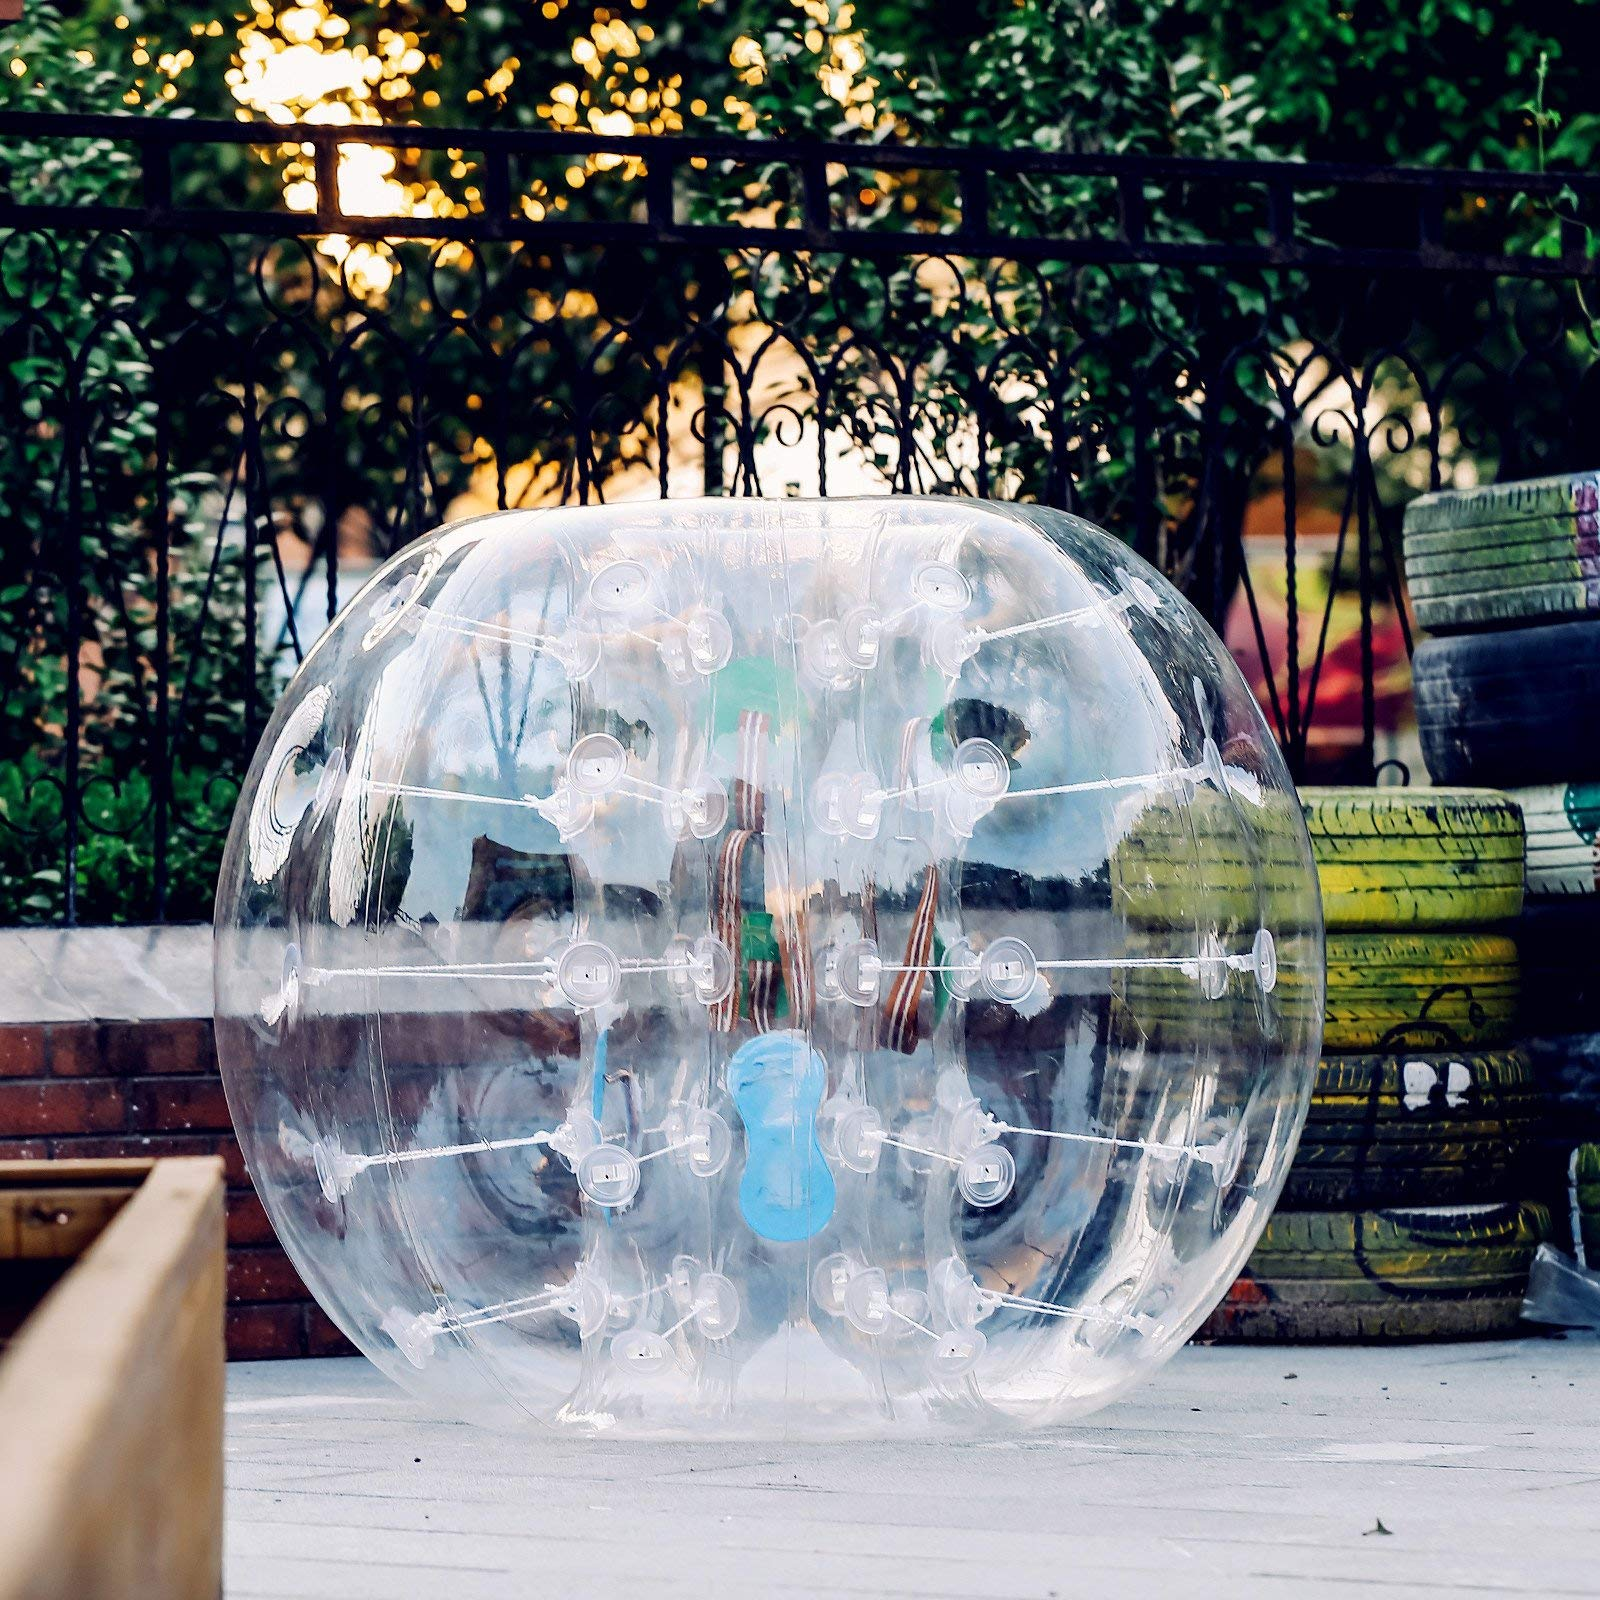 Popsport Inflatable Bumper Ball